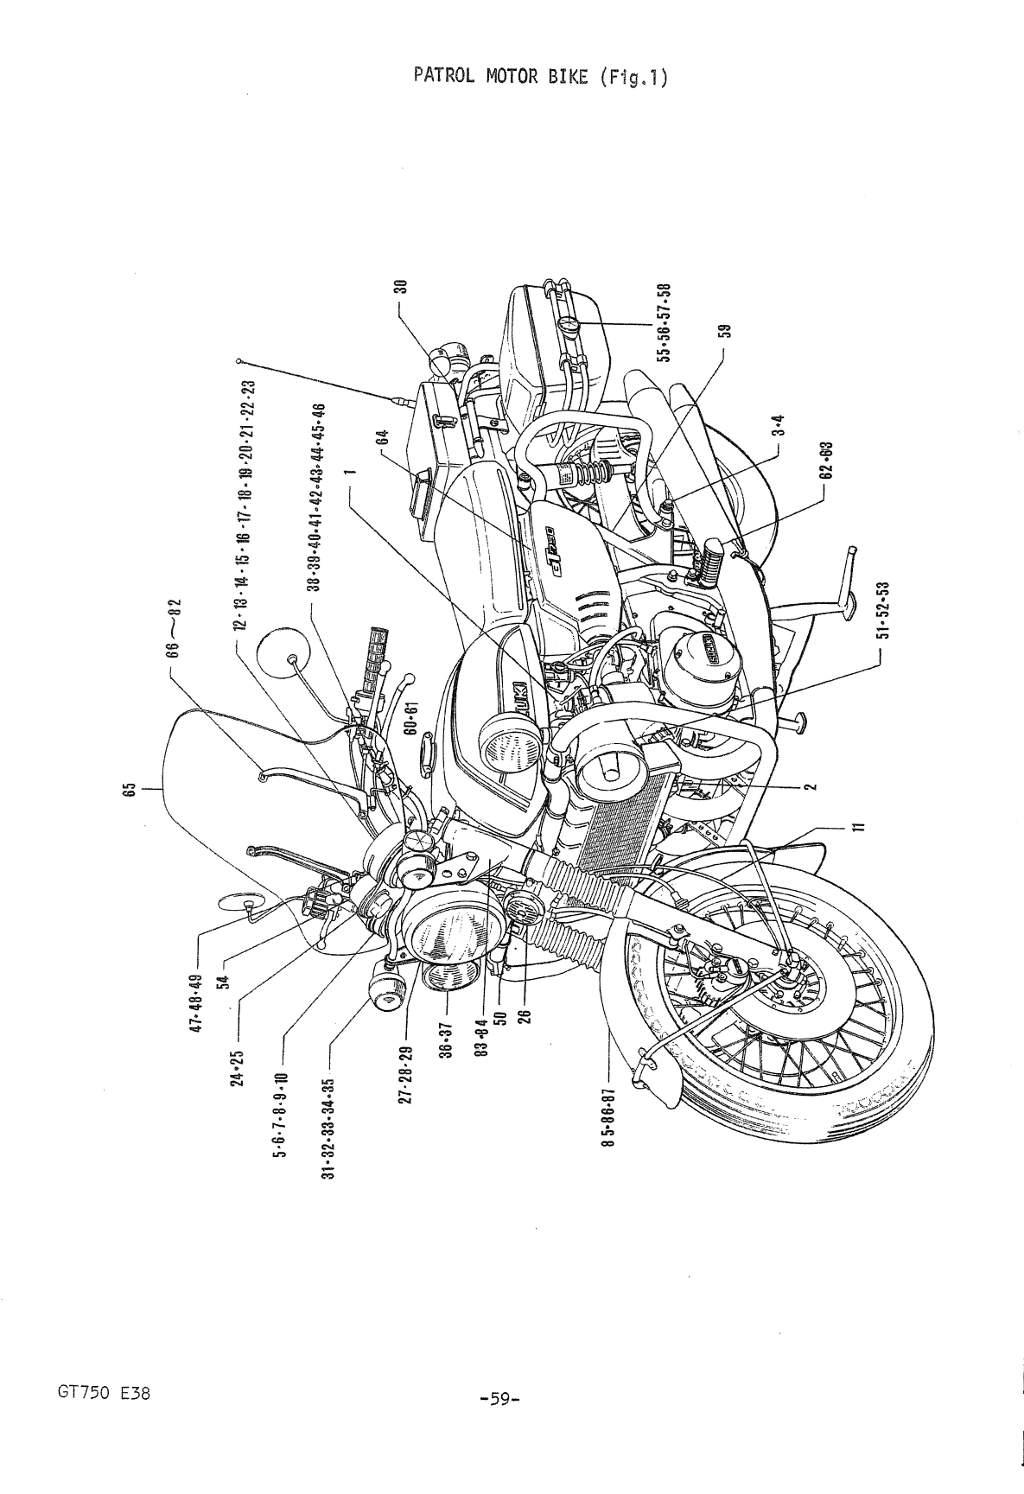 A Field Guide to the Suzuki GT750